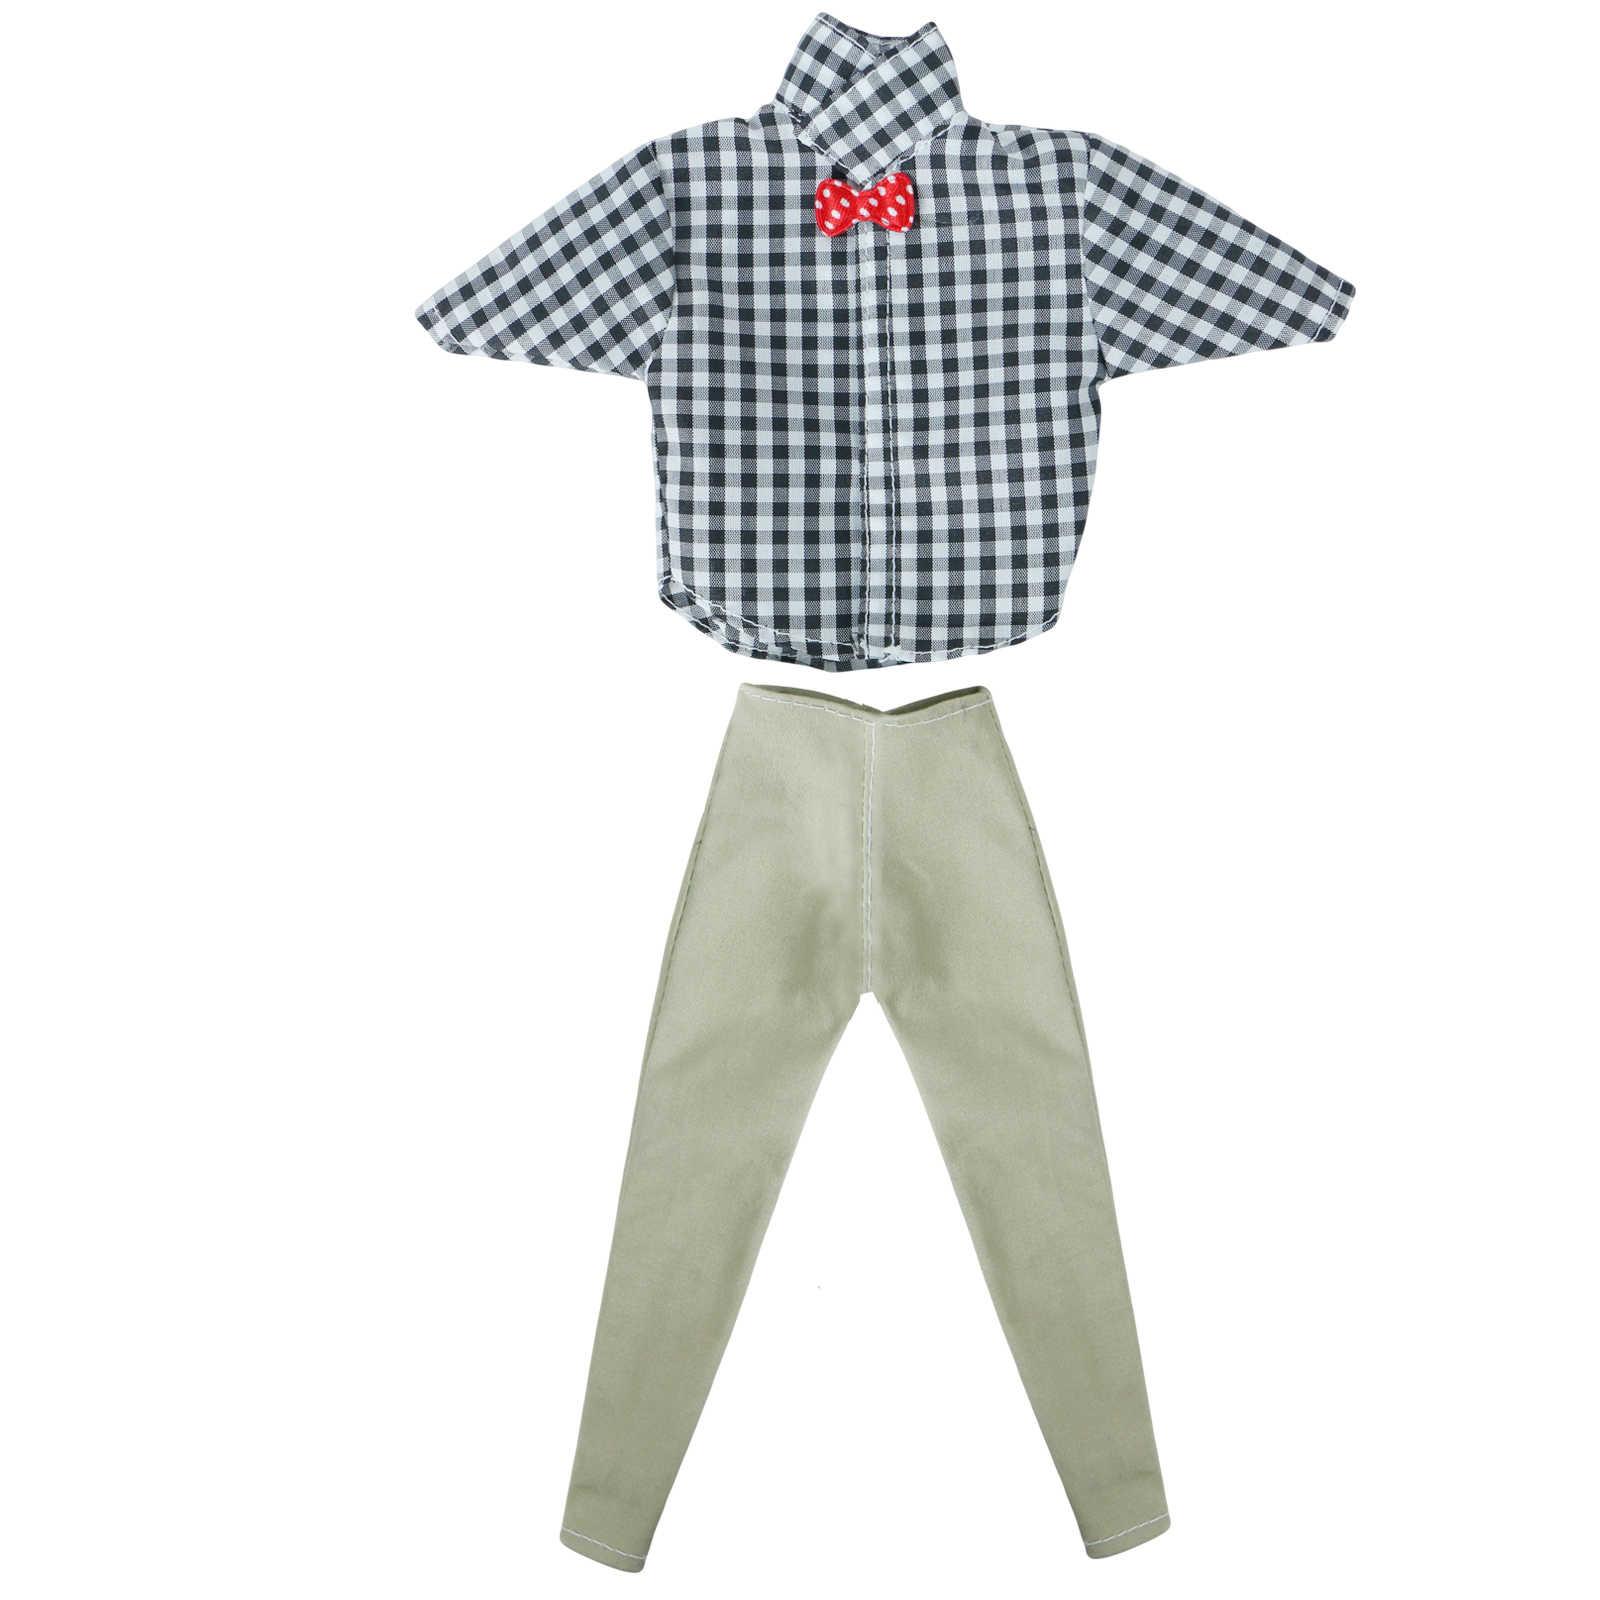 1 Conjunto de trajes de hombre de moda Bowknot Plaid pantalones de camisa de manga corta ropa Casual accesorios para Barbie Doll Ken juguete